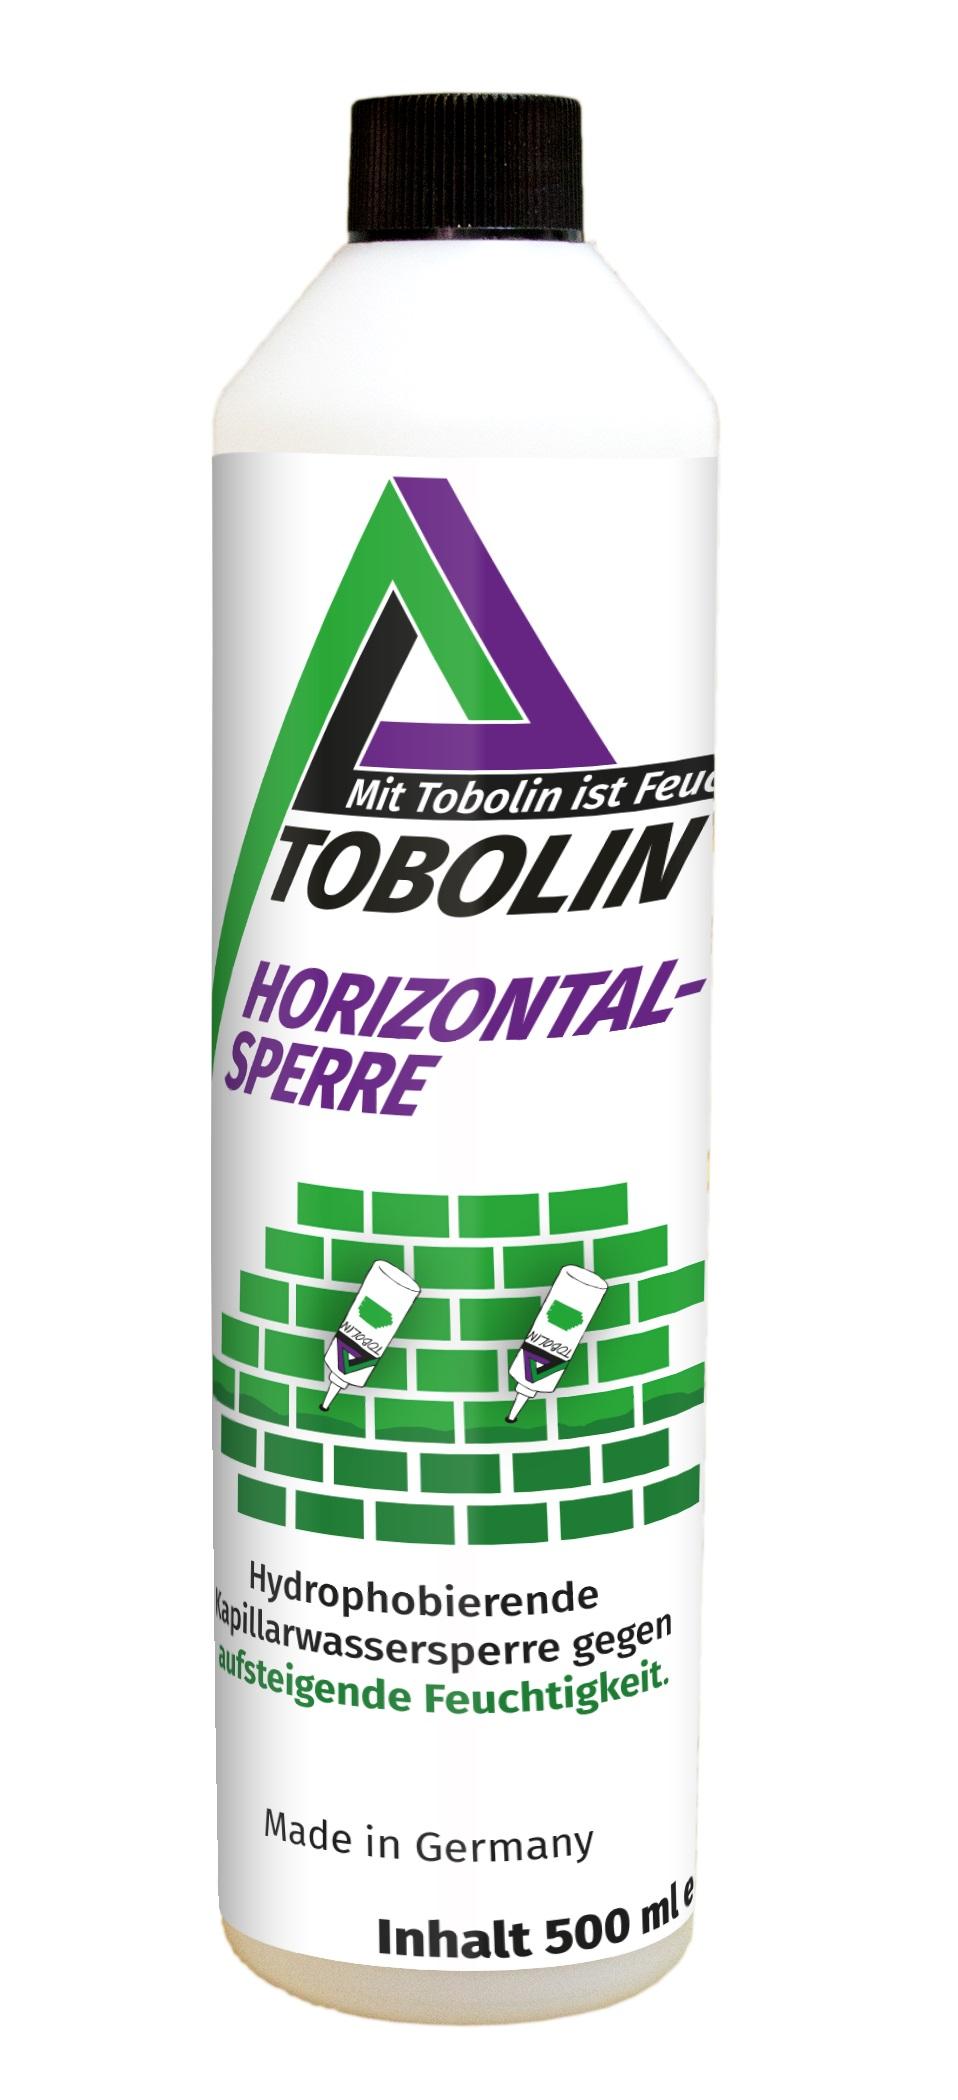 tobolin-flasche-produtkbild